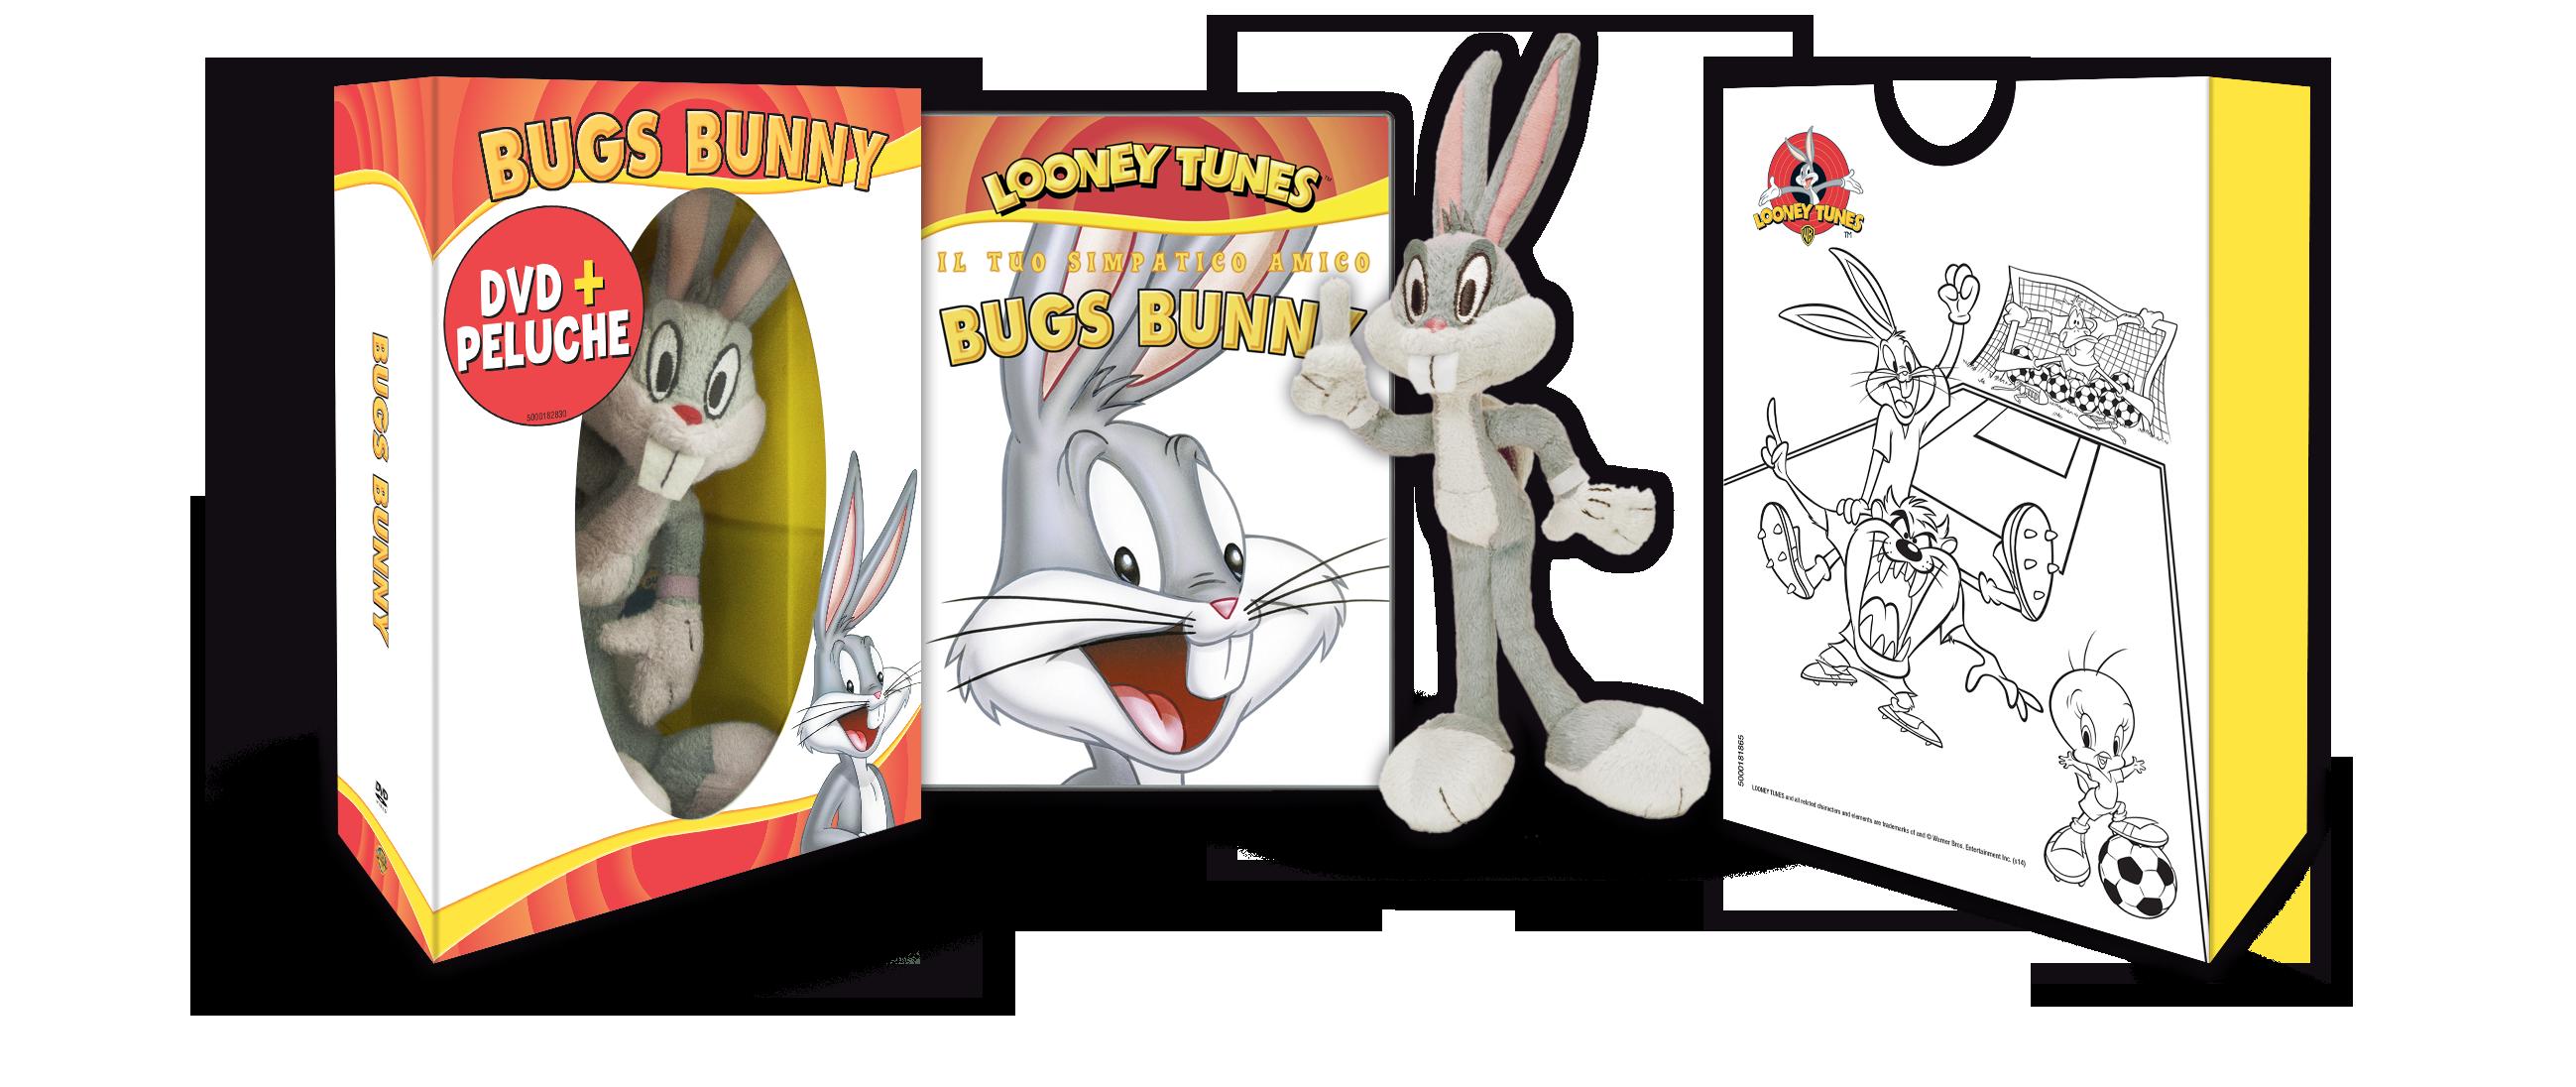 looney tunes peluche bugs bunny